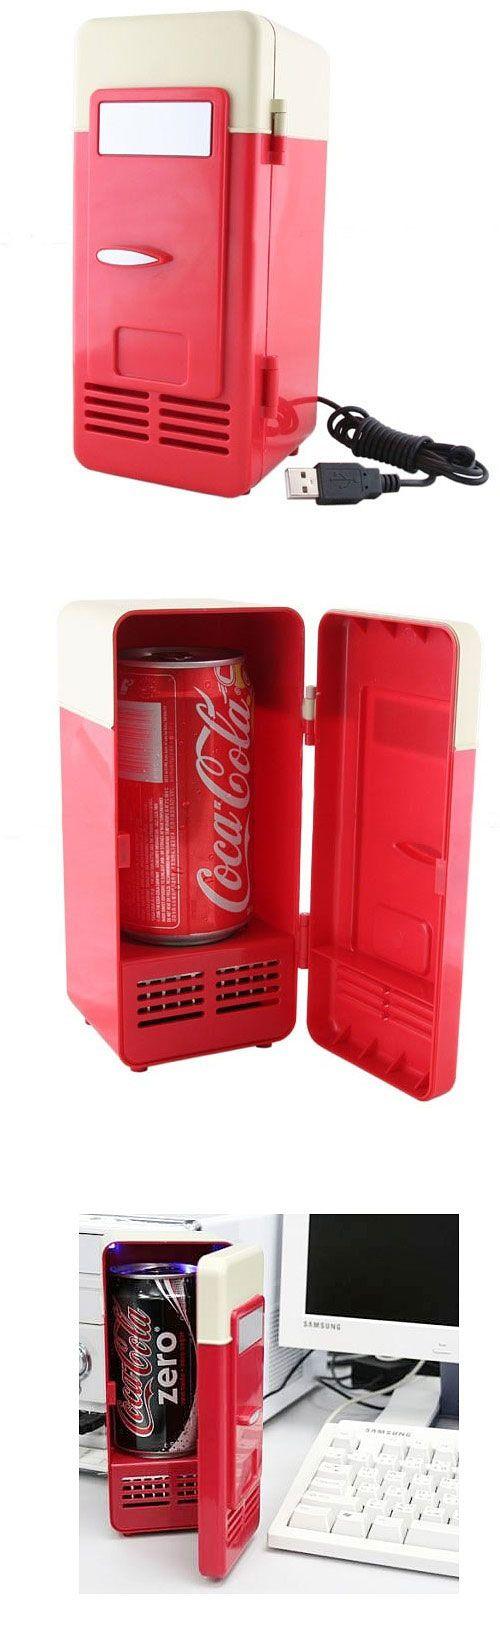 USB Refrigerator...Shut up and take my money!